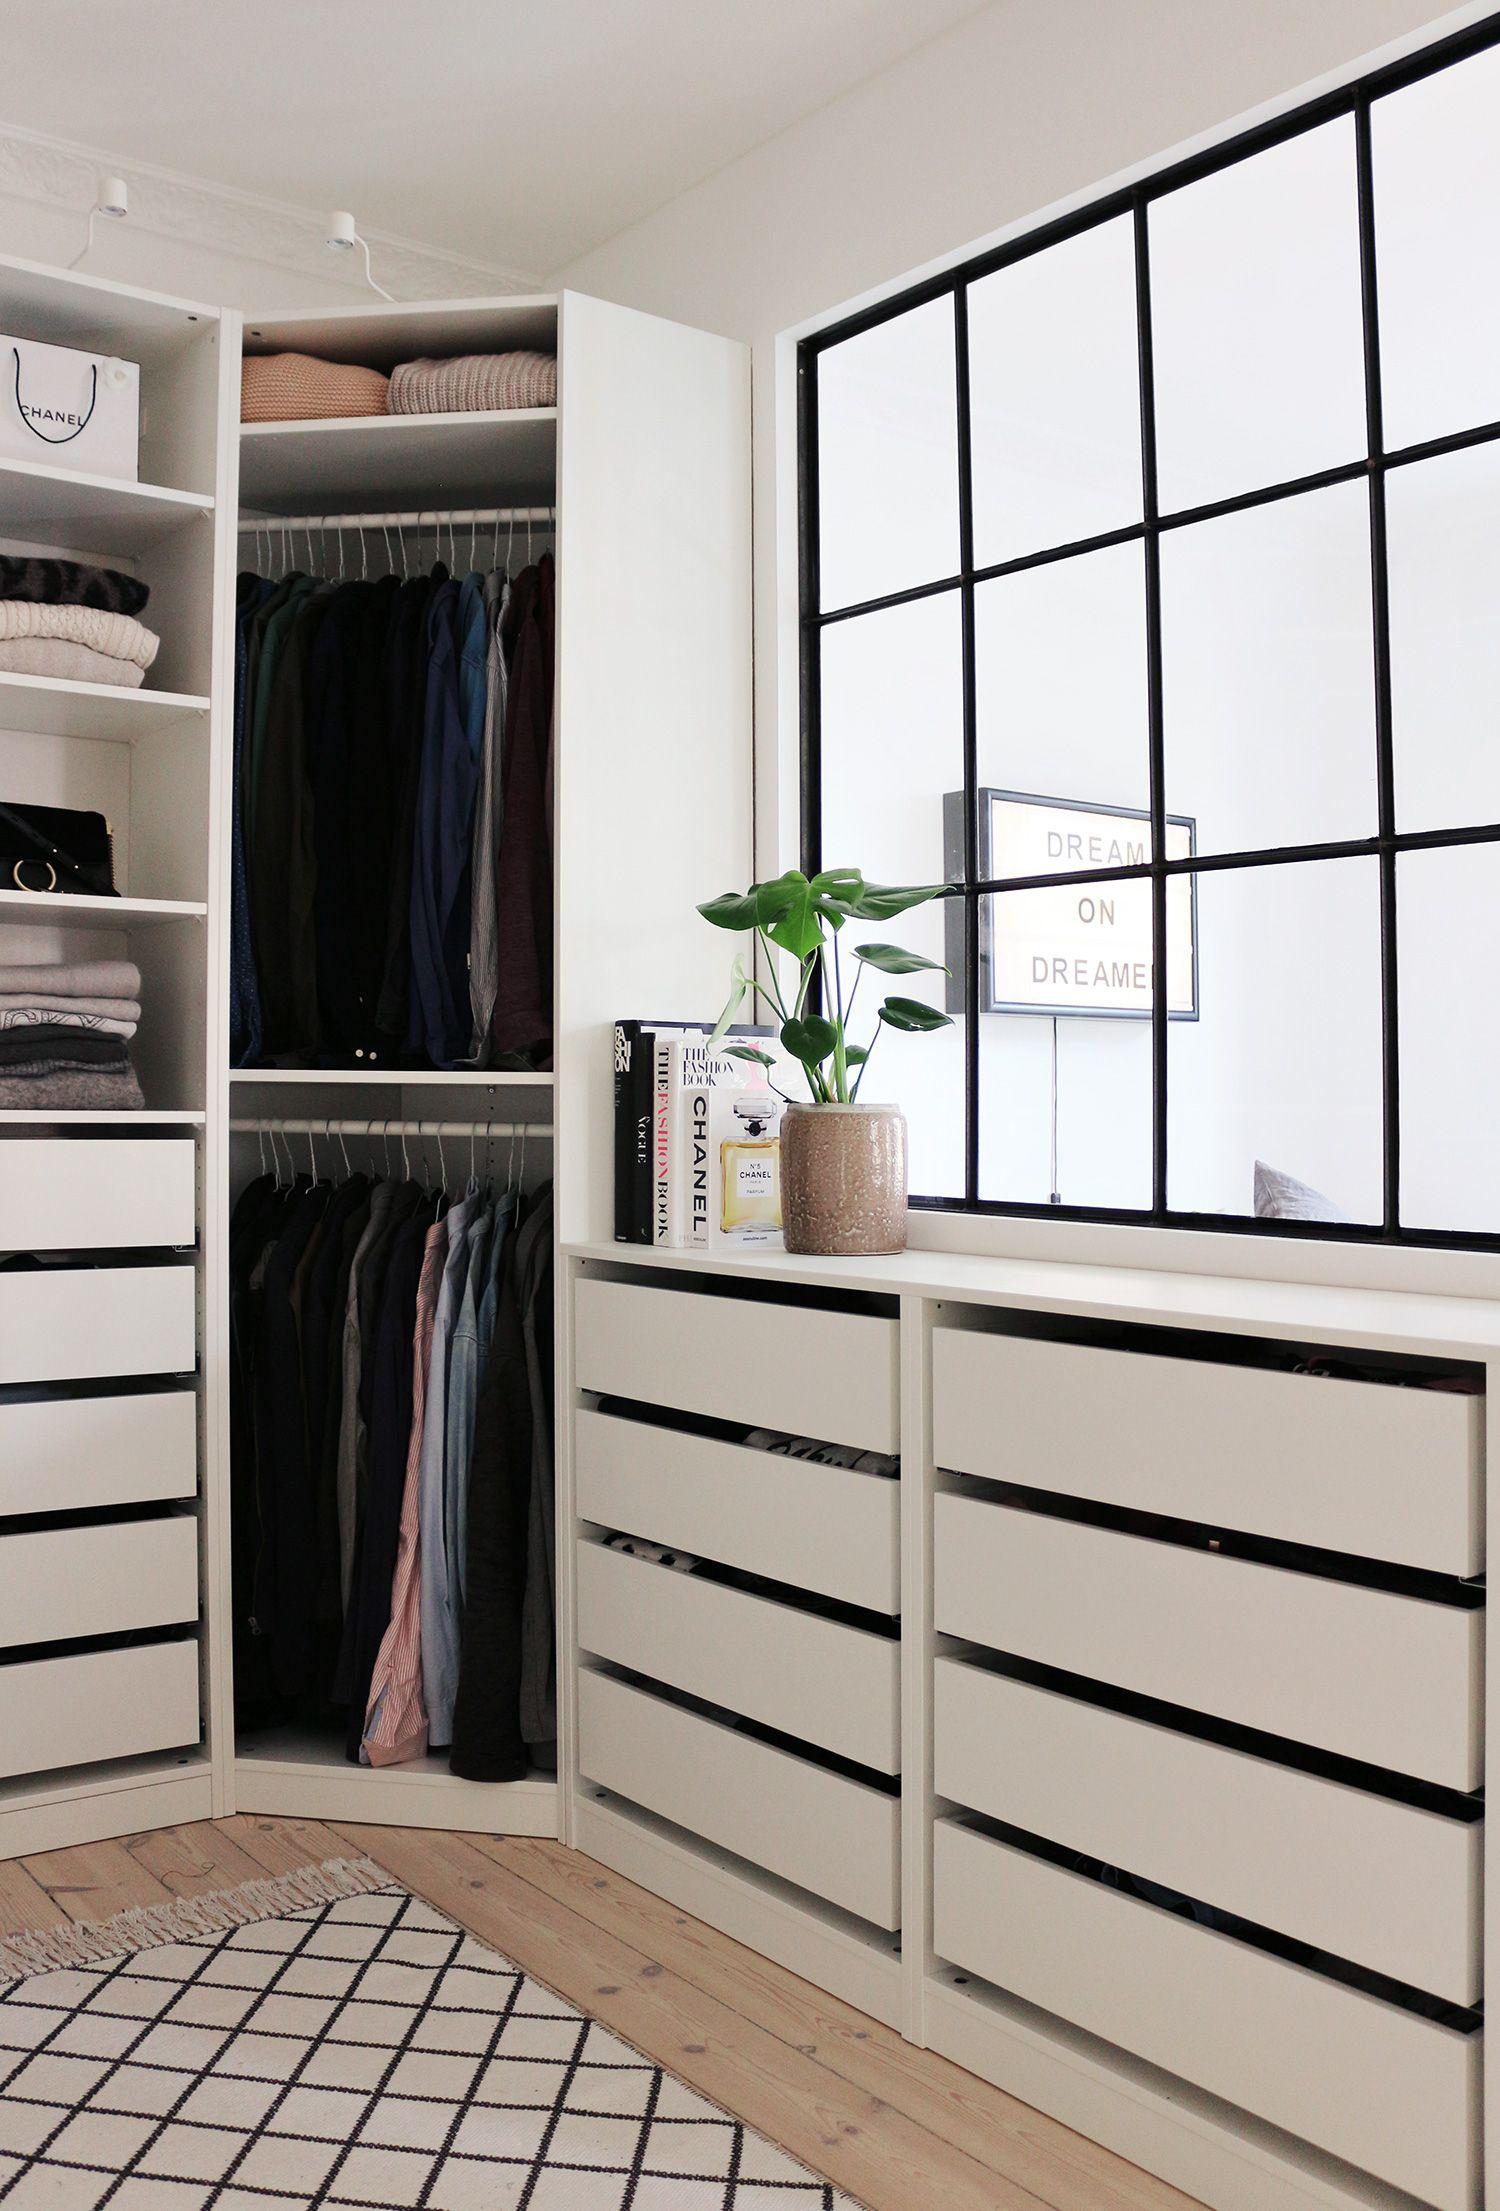 Begehbarer kleiderschrank selber bauen ikea  Walk in Closet IKEA PAX Inspiration | Closet | Pinterest ...